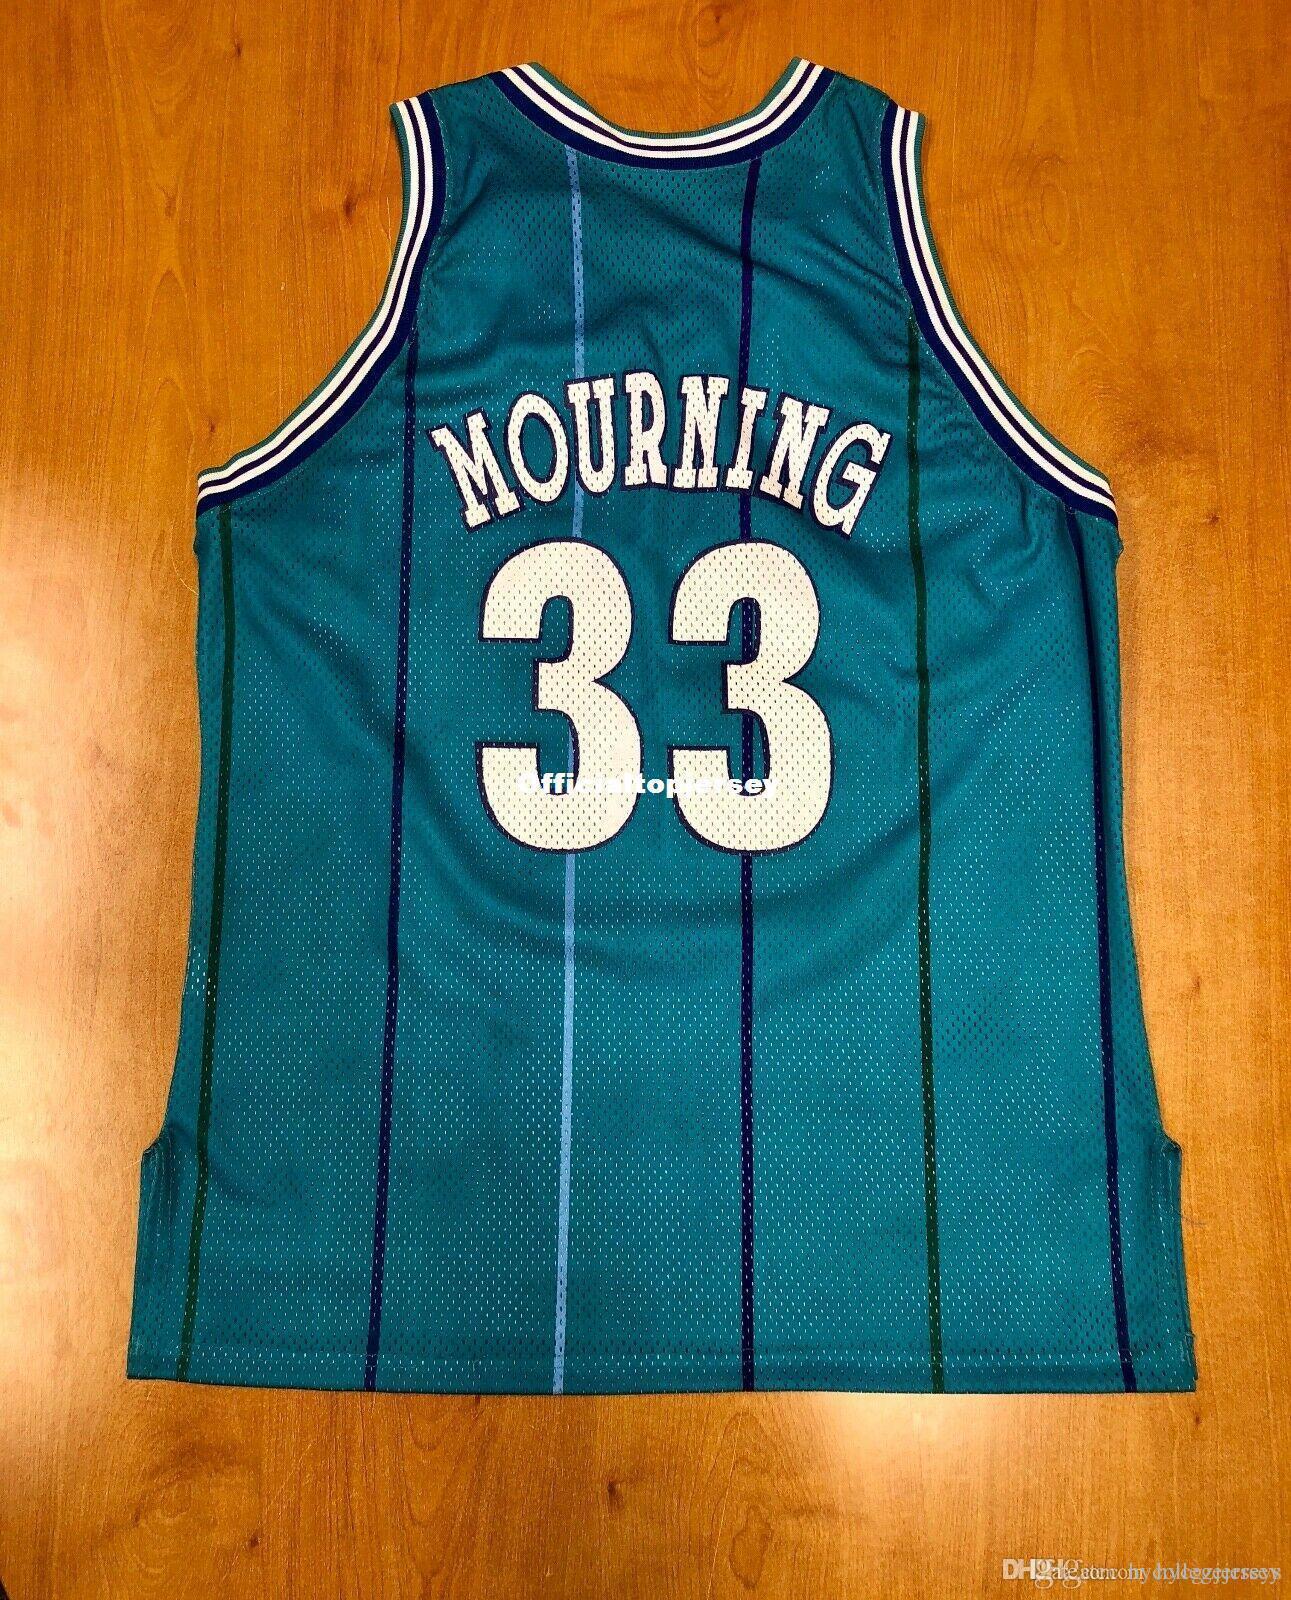 Дешевый Vintage Retro 1995 Моурнинг NOK Top Champion Джерси ходок Мужчина XS-5XL.6XL рубашки прошитого баскетбольное ретро NCAA